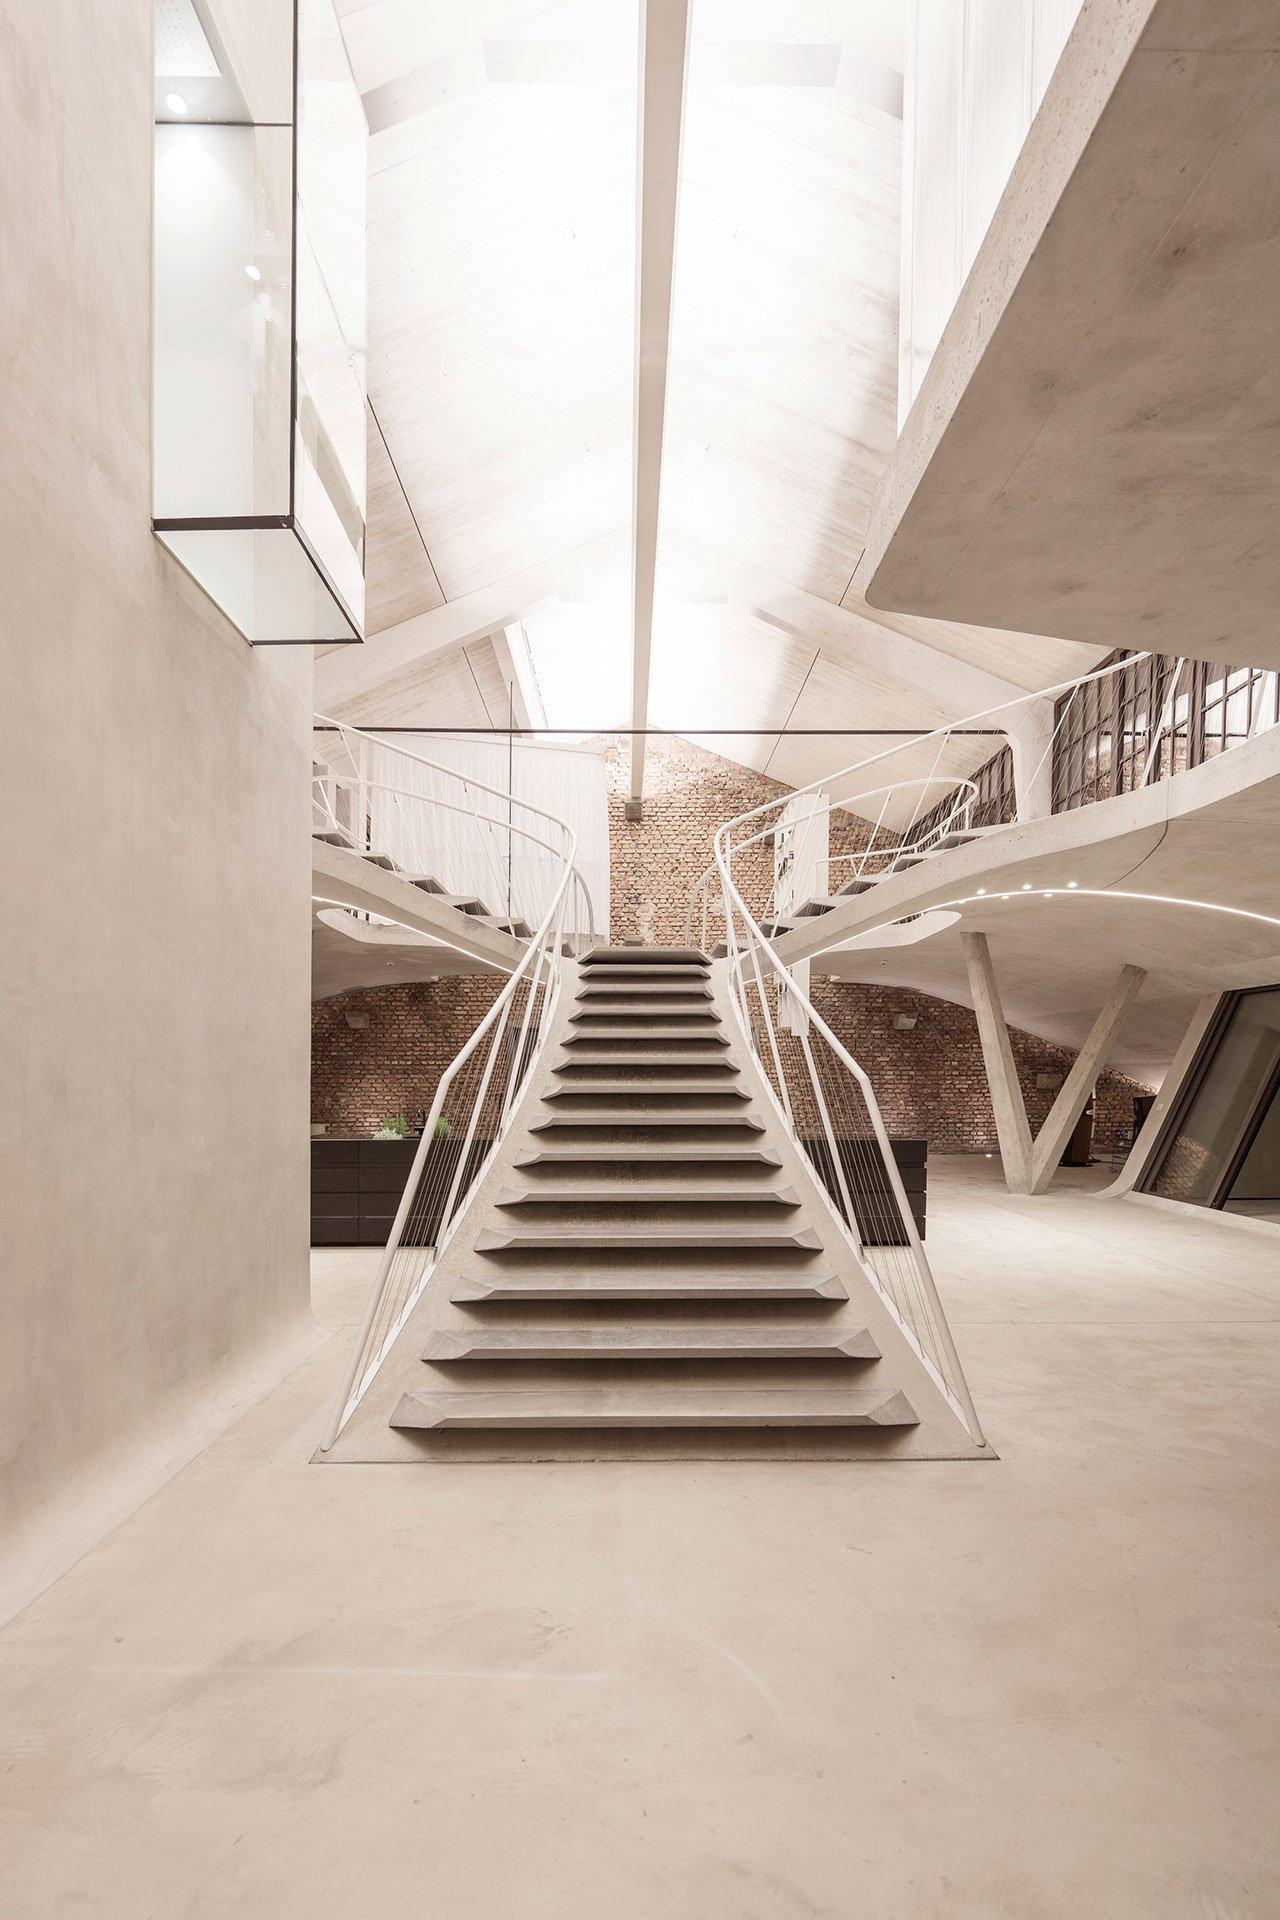 salzburgi-panzerhalle-loft-nagyvonalu-nyitott-terek-noko-01.jpg